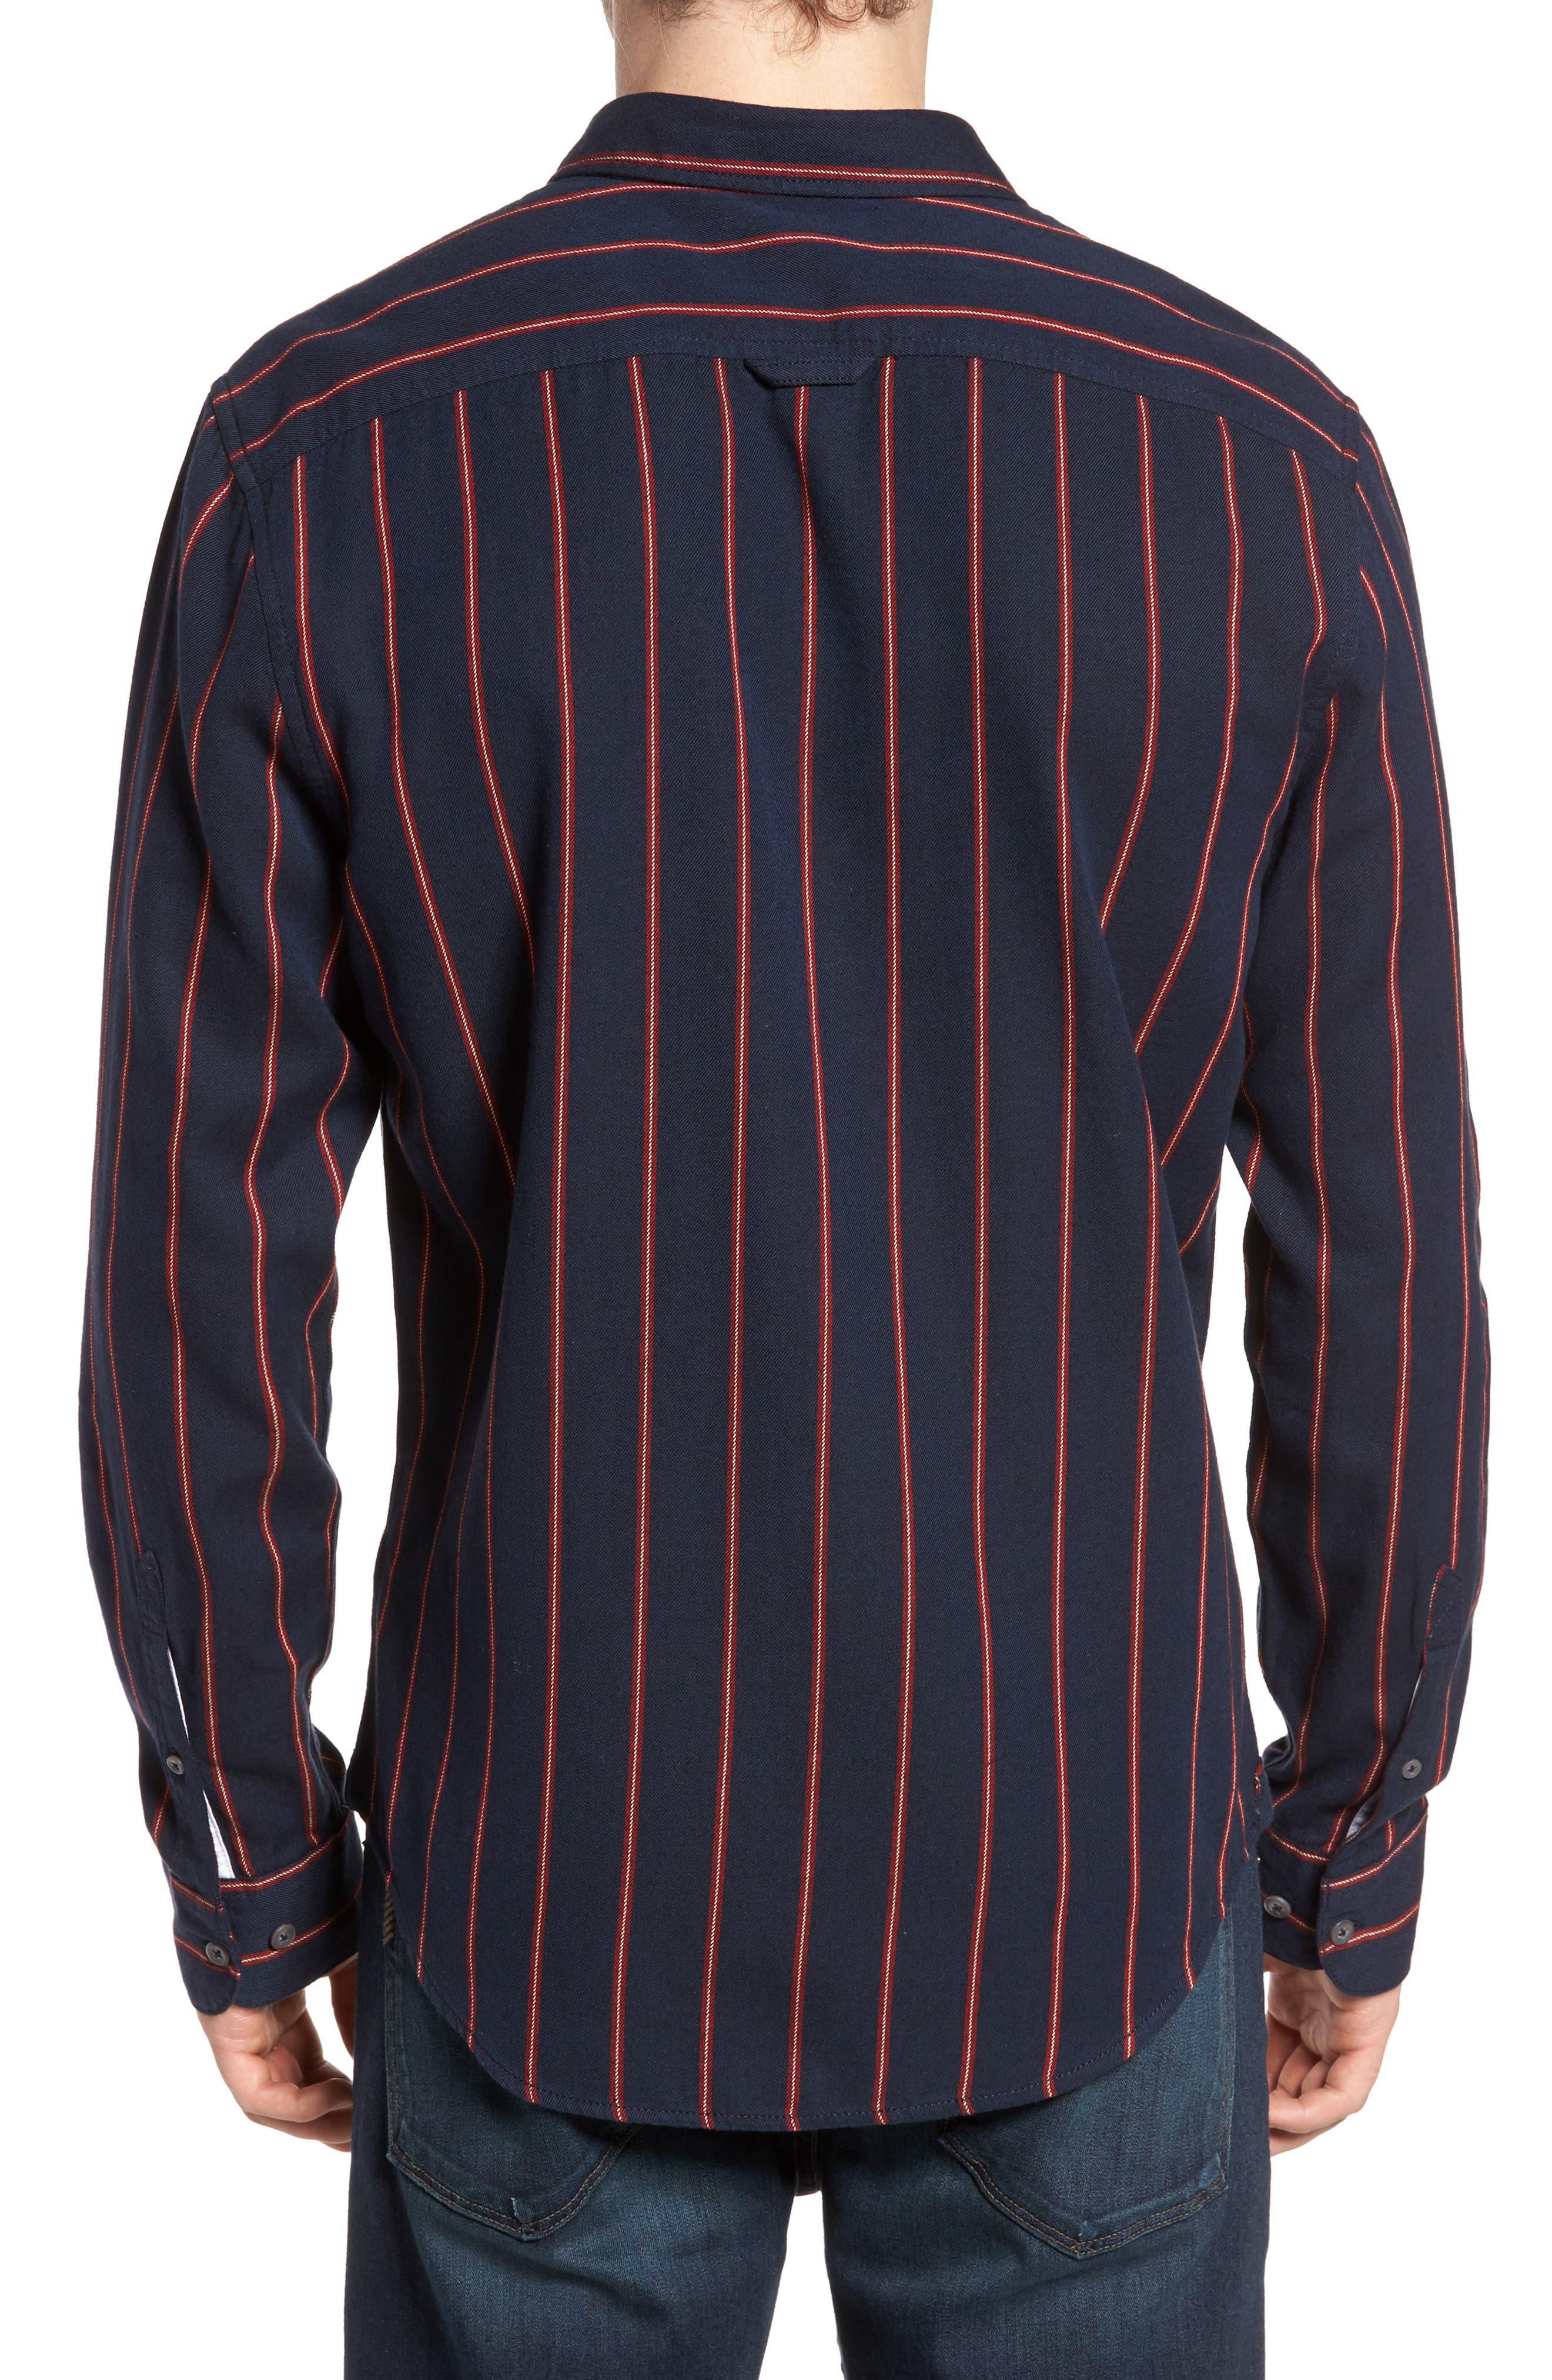 The Rail Long Sleeve Twill Shirt,                             Alternate thumbnail 2, color,                             Navy Peacoat Red Stripe